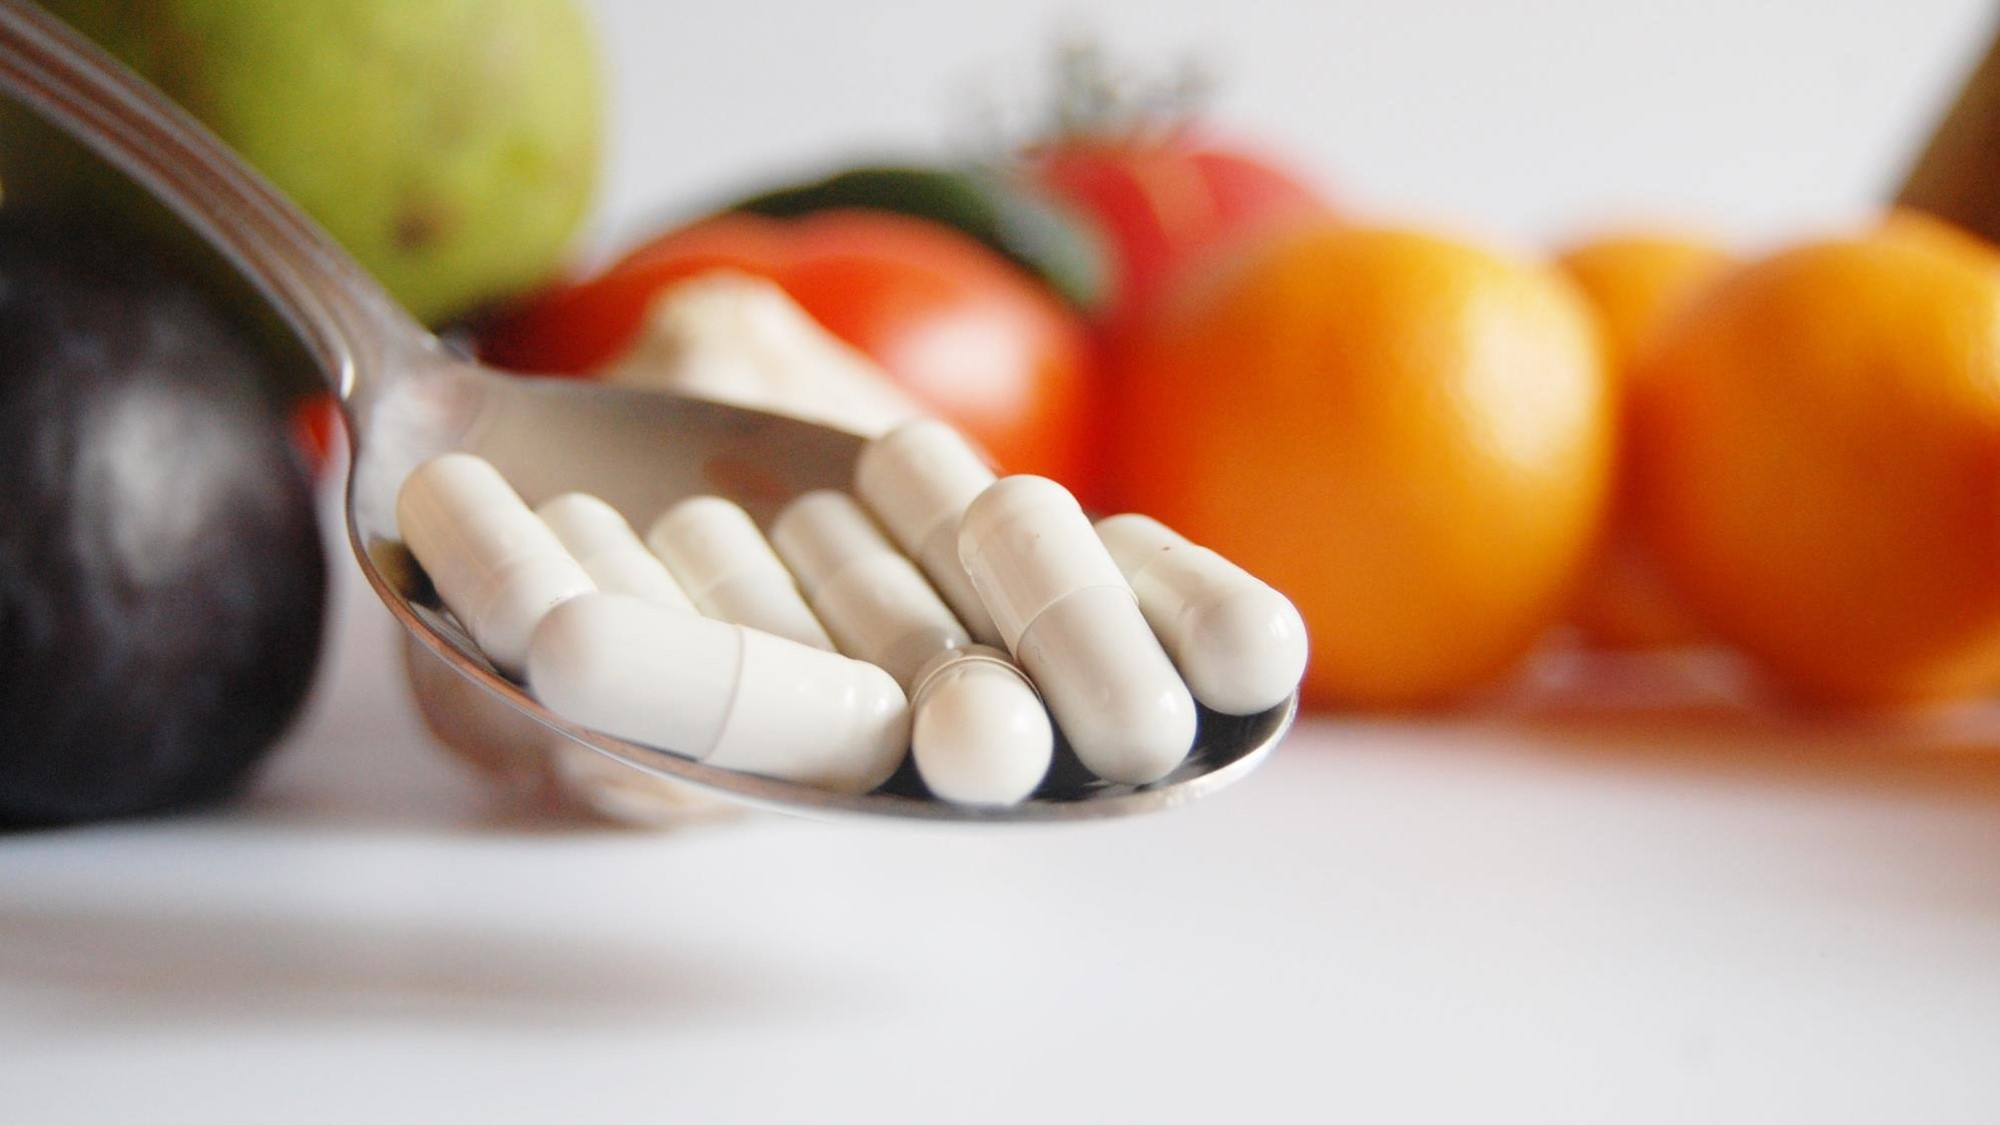 Sind Nahrungsergänzungsmittel sinnvoll?